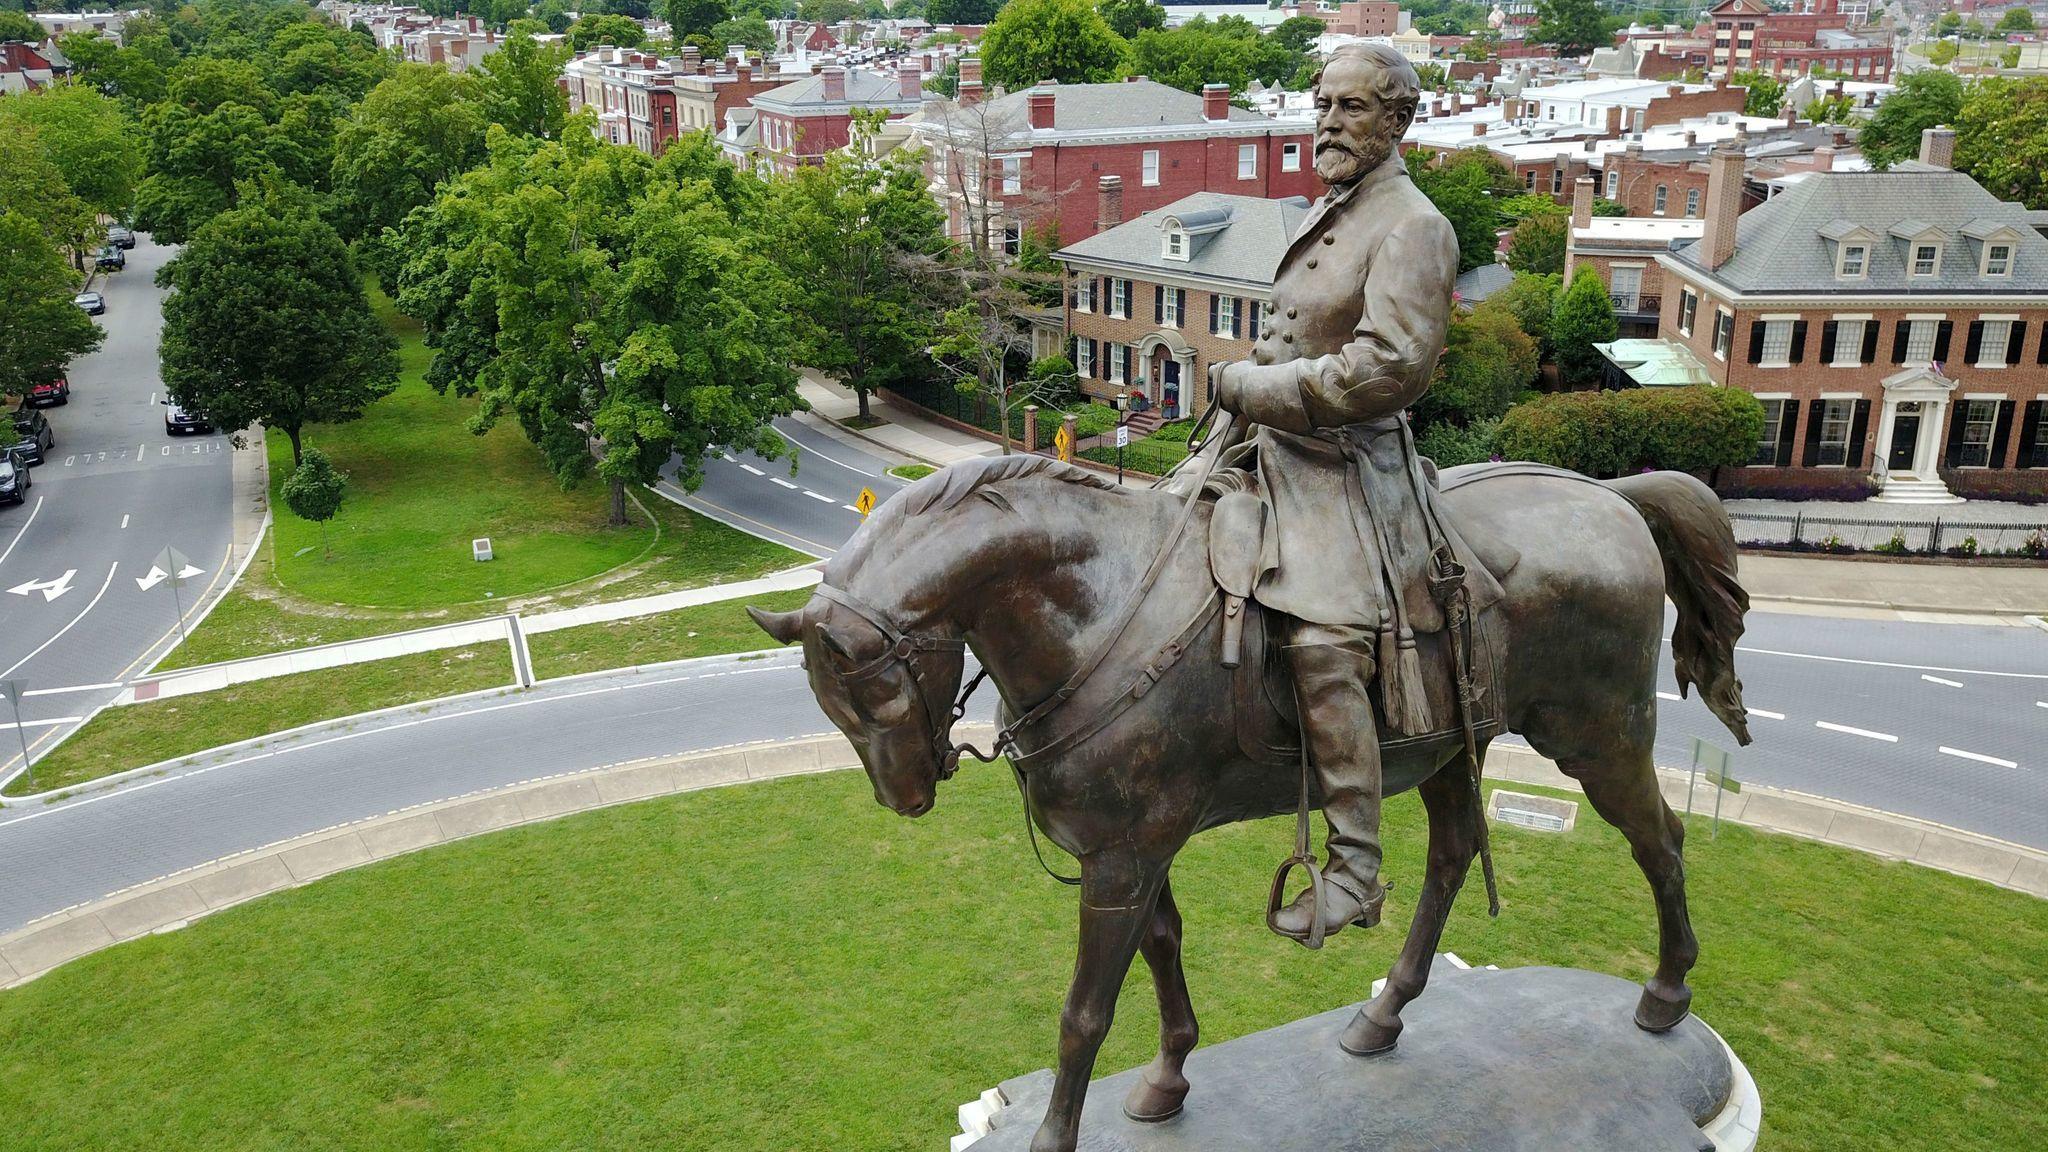 A statue of Confederate Gen. Robert E. Lee in Richmond, Va.